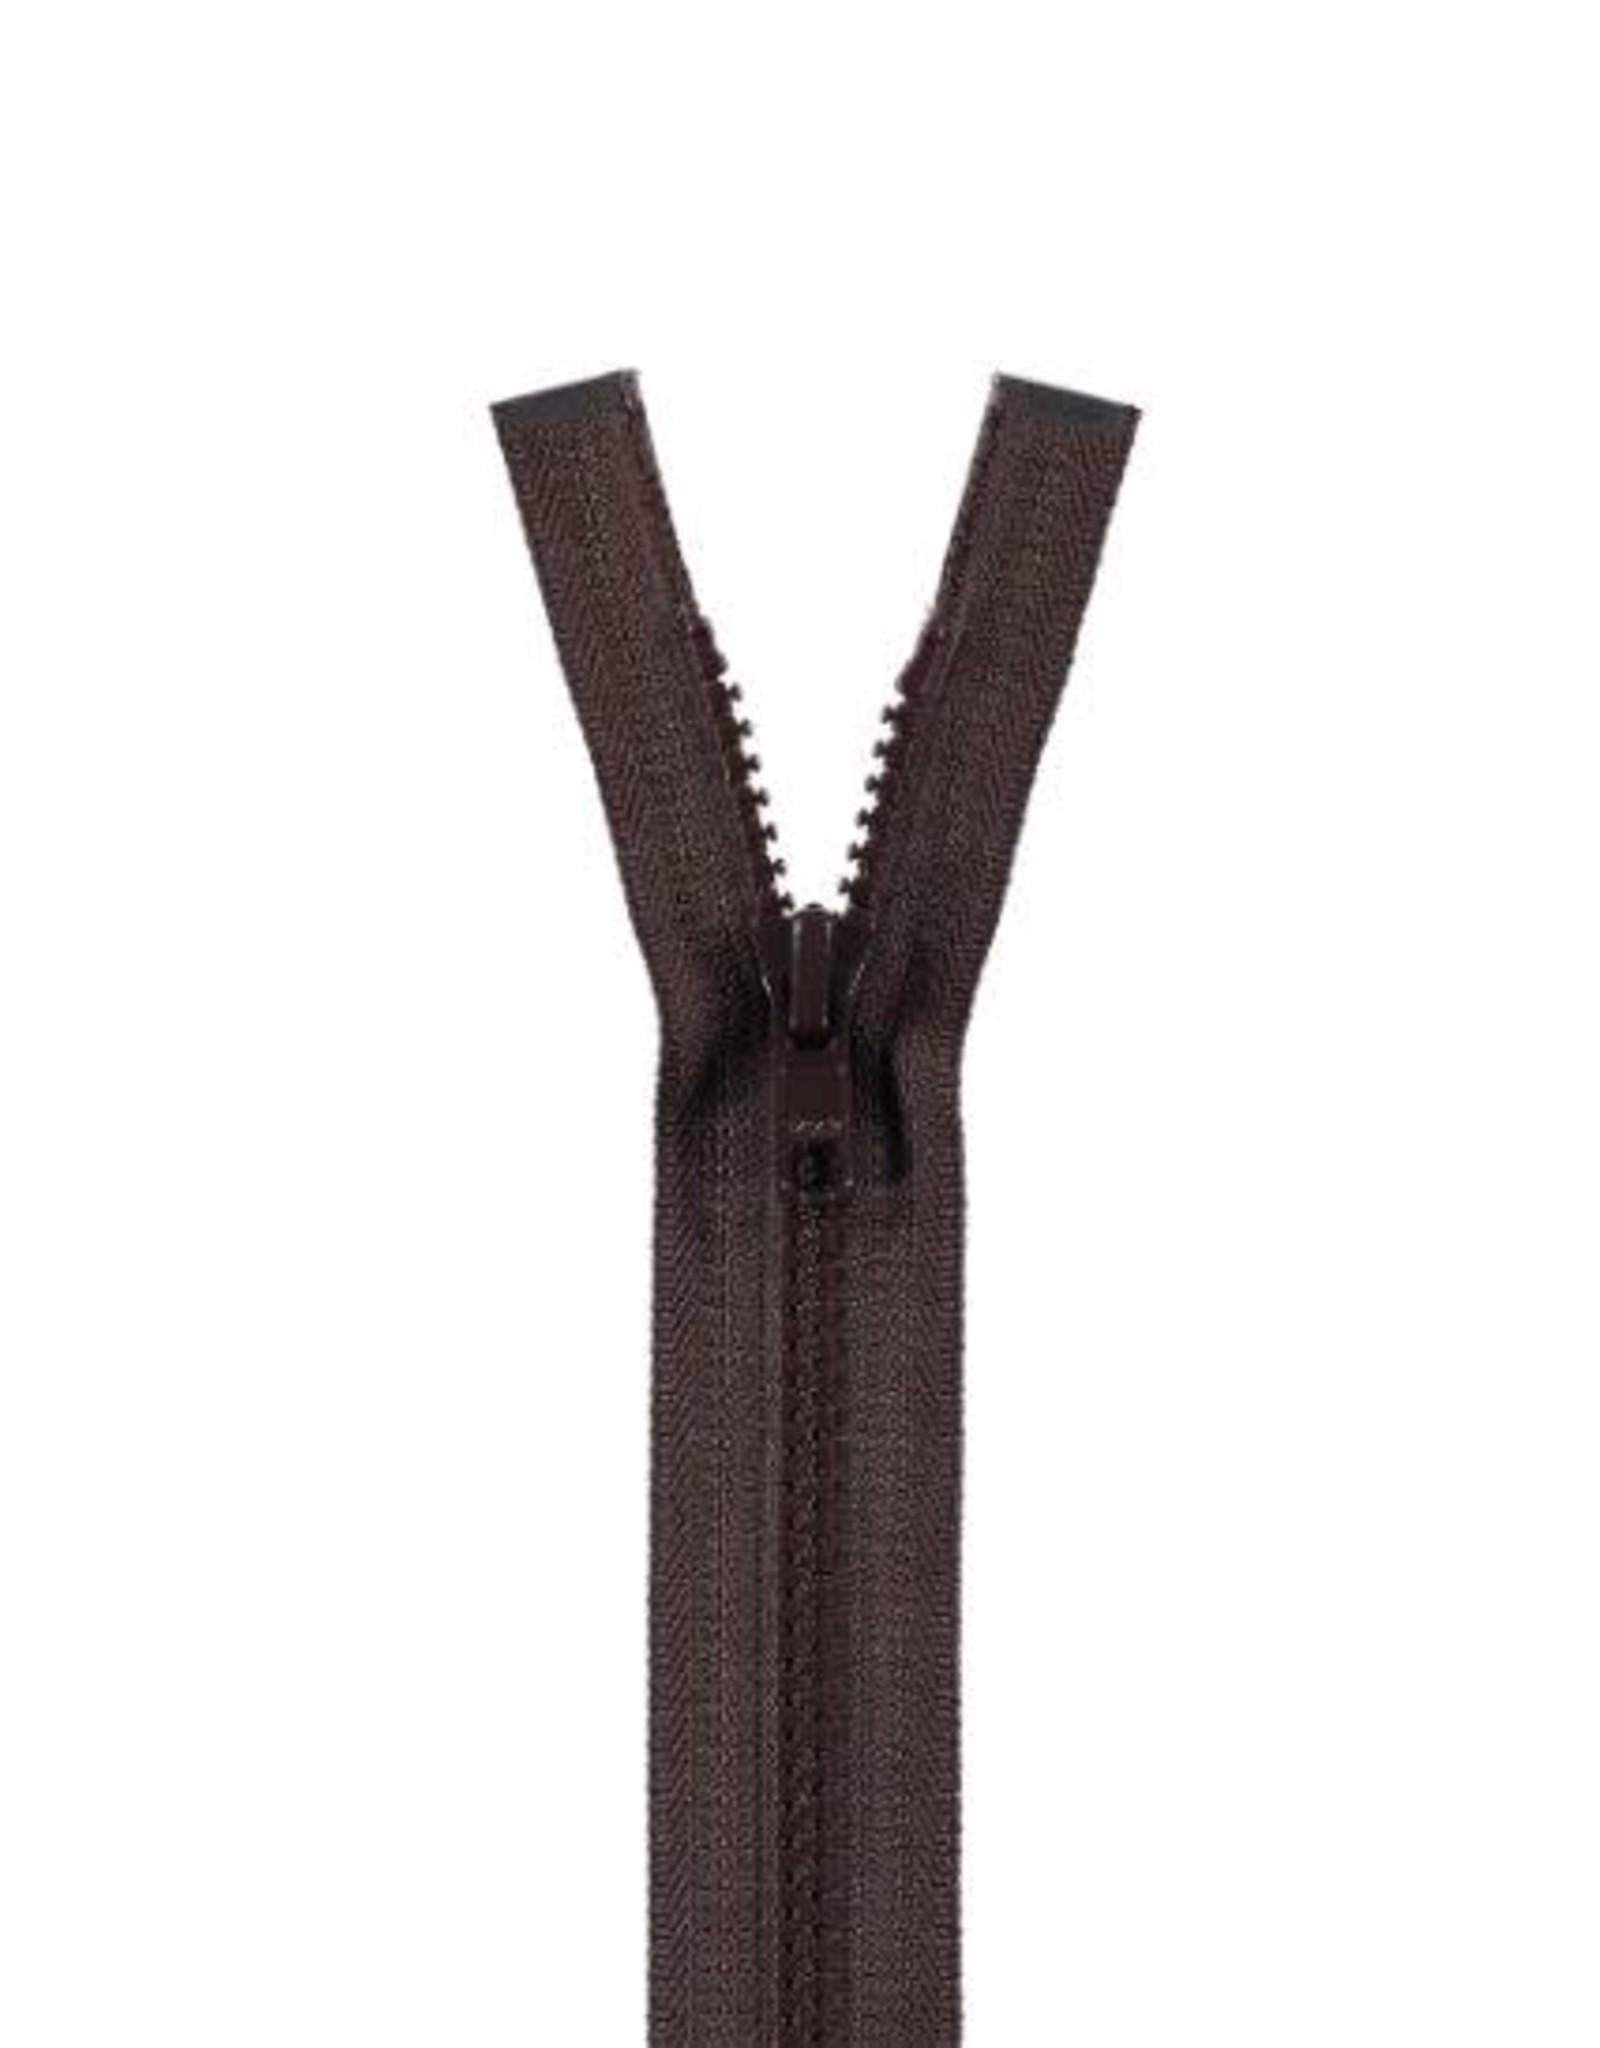 YKK BLOKRITS 5 DEELBAAR bruin 570-30cm